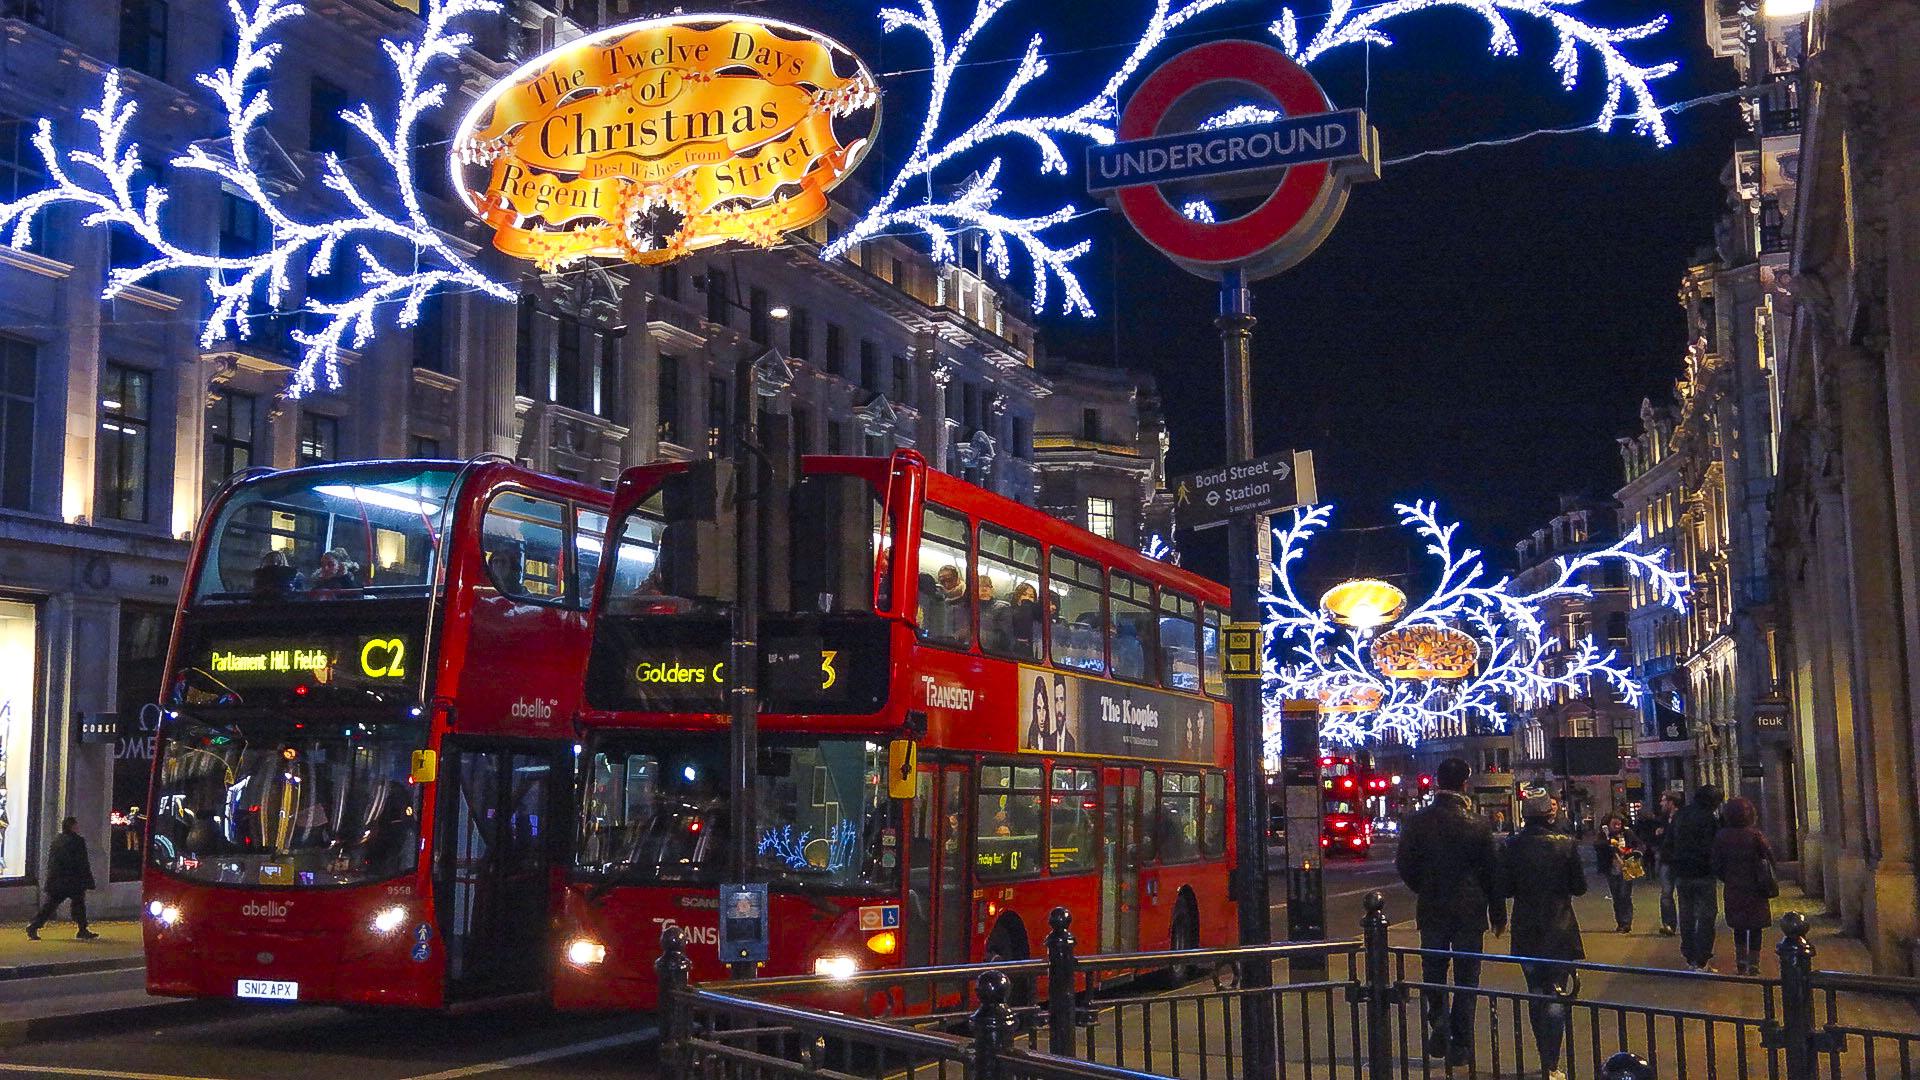 Merry Christmas London. Christmas Choral 2018 в Дьюсбери.